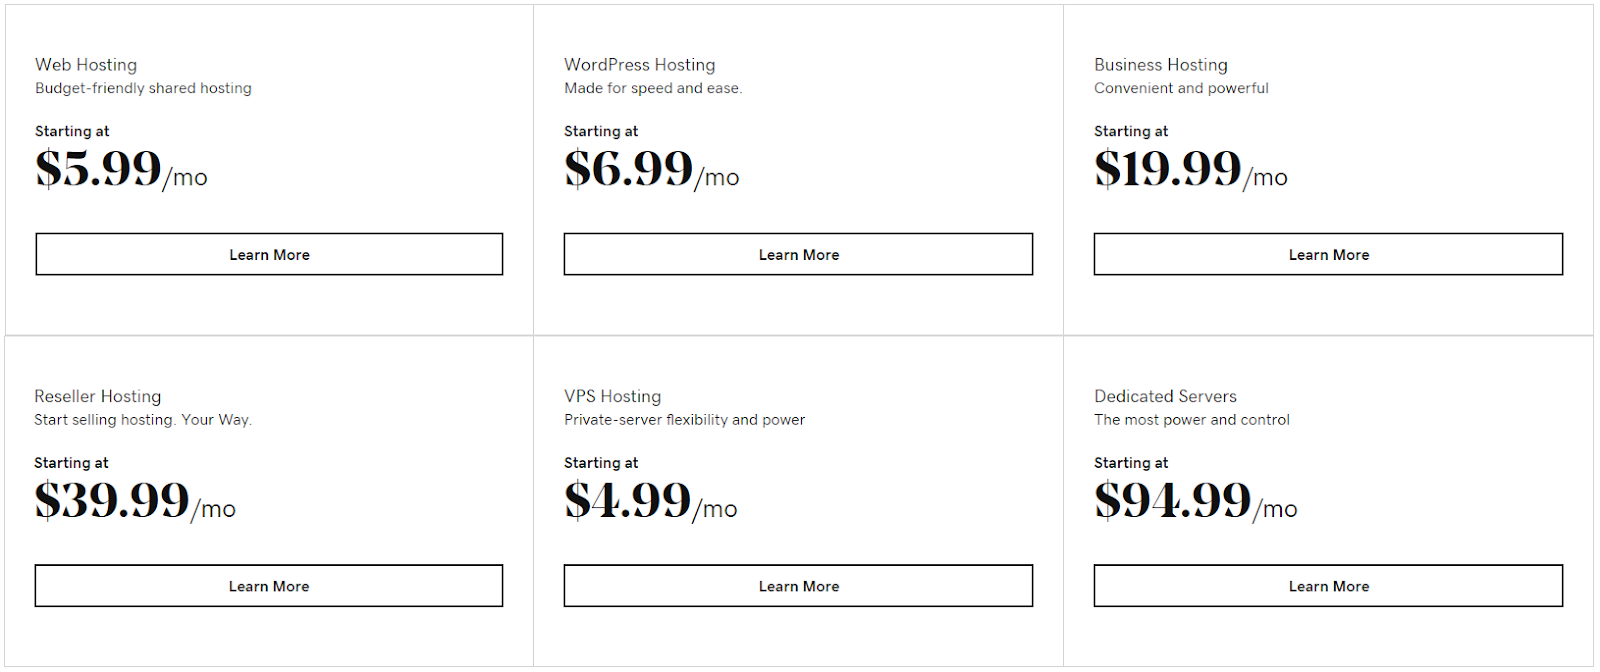 GoDaddy's web hosting pricing plans